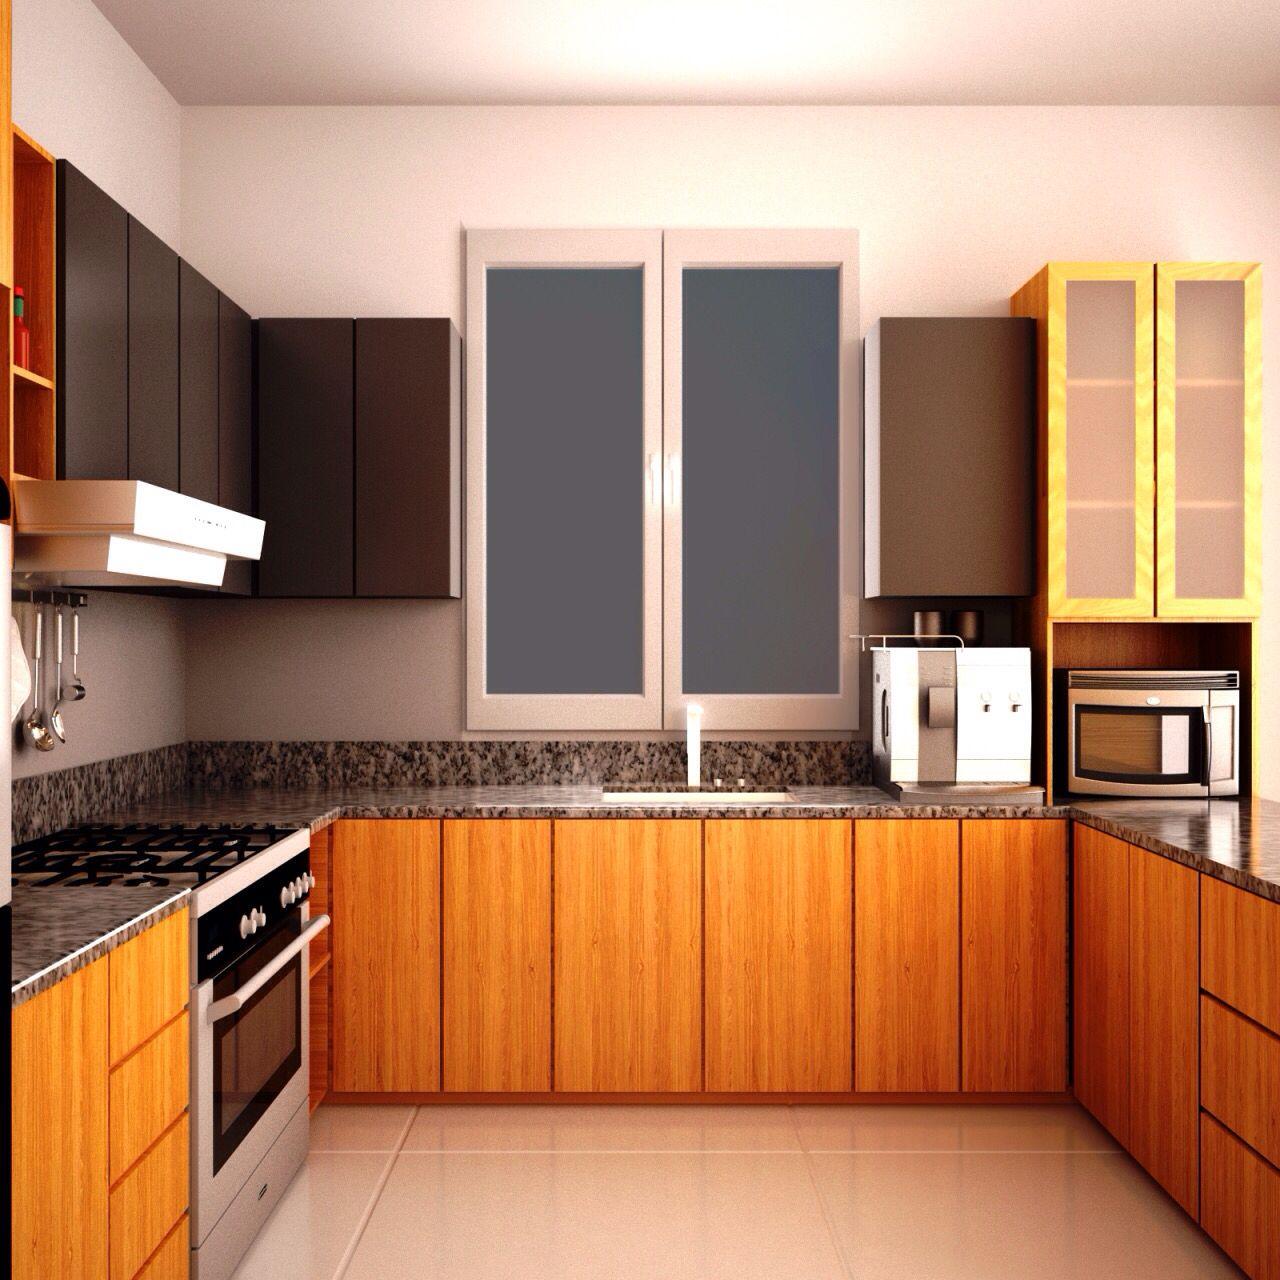 Belajar bikin kitchen set Cek tukangmeubelmurahcom Belajar